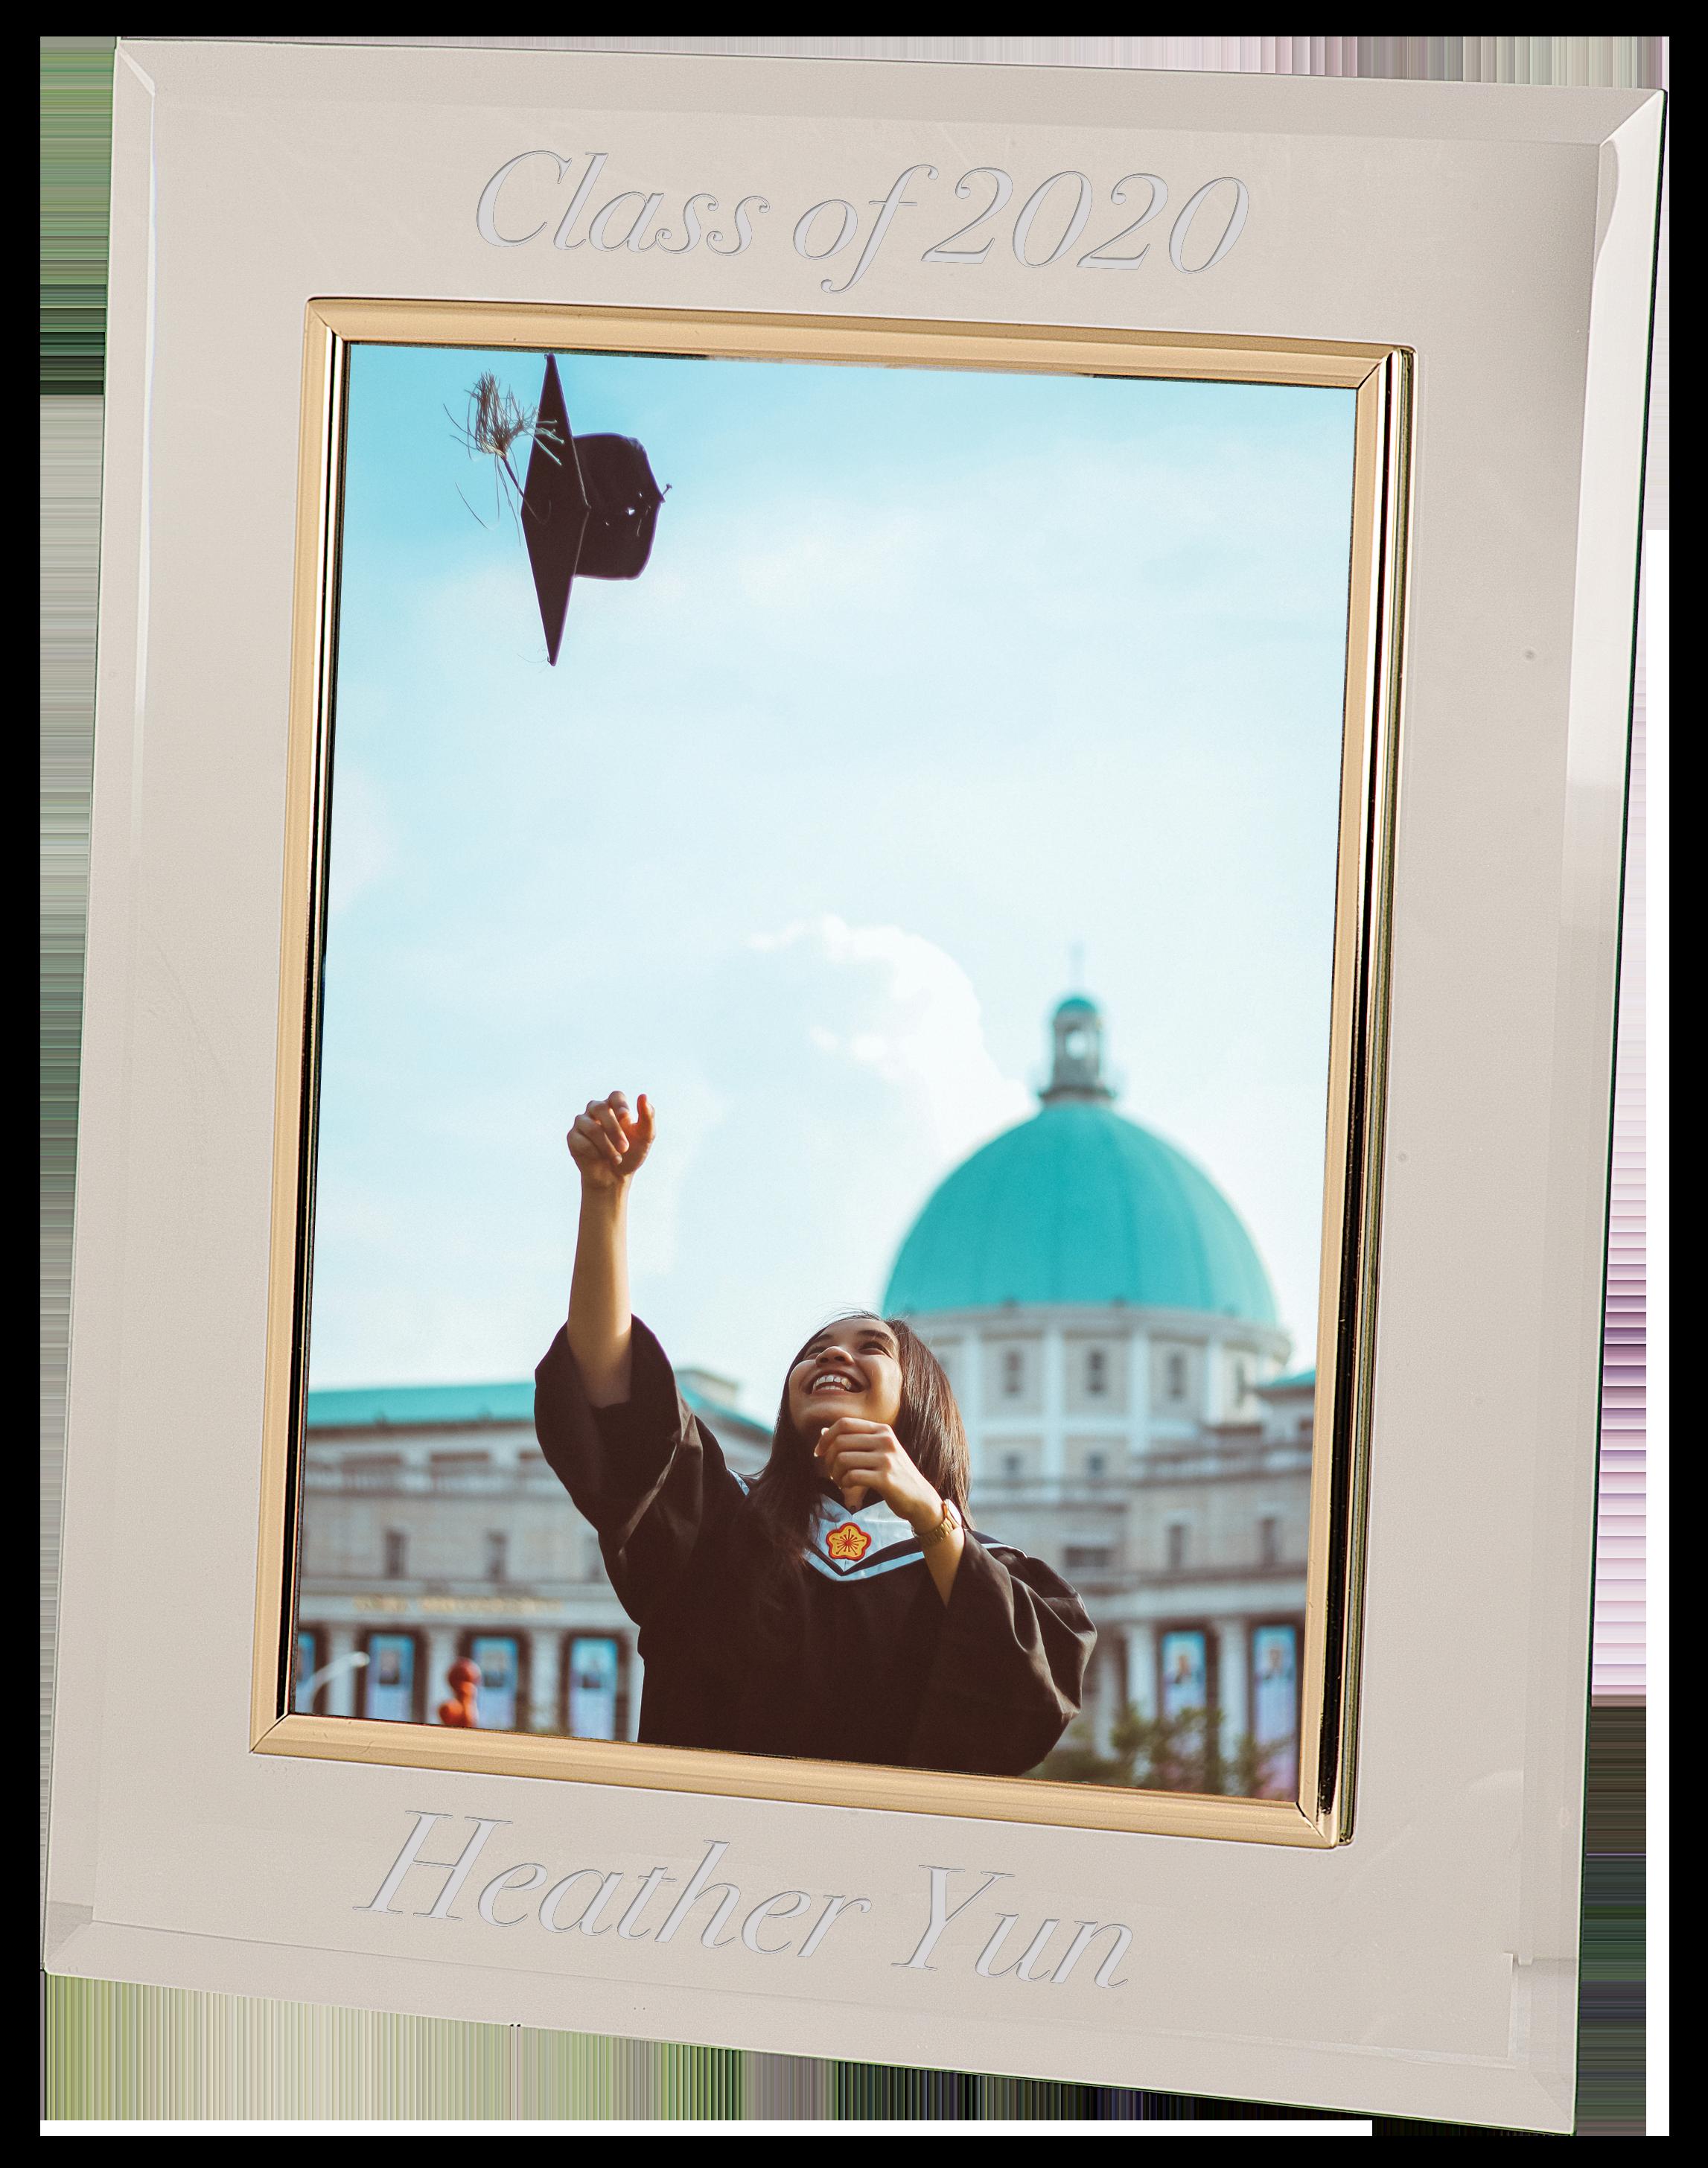 2020 Graduation Gifts 1